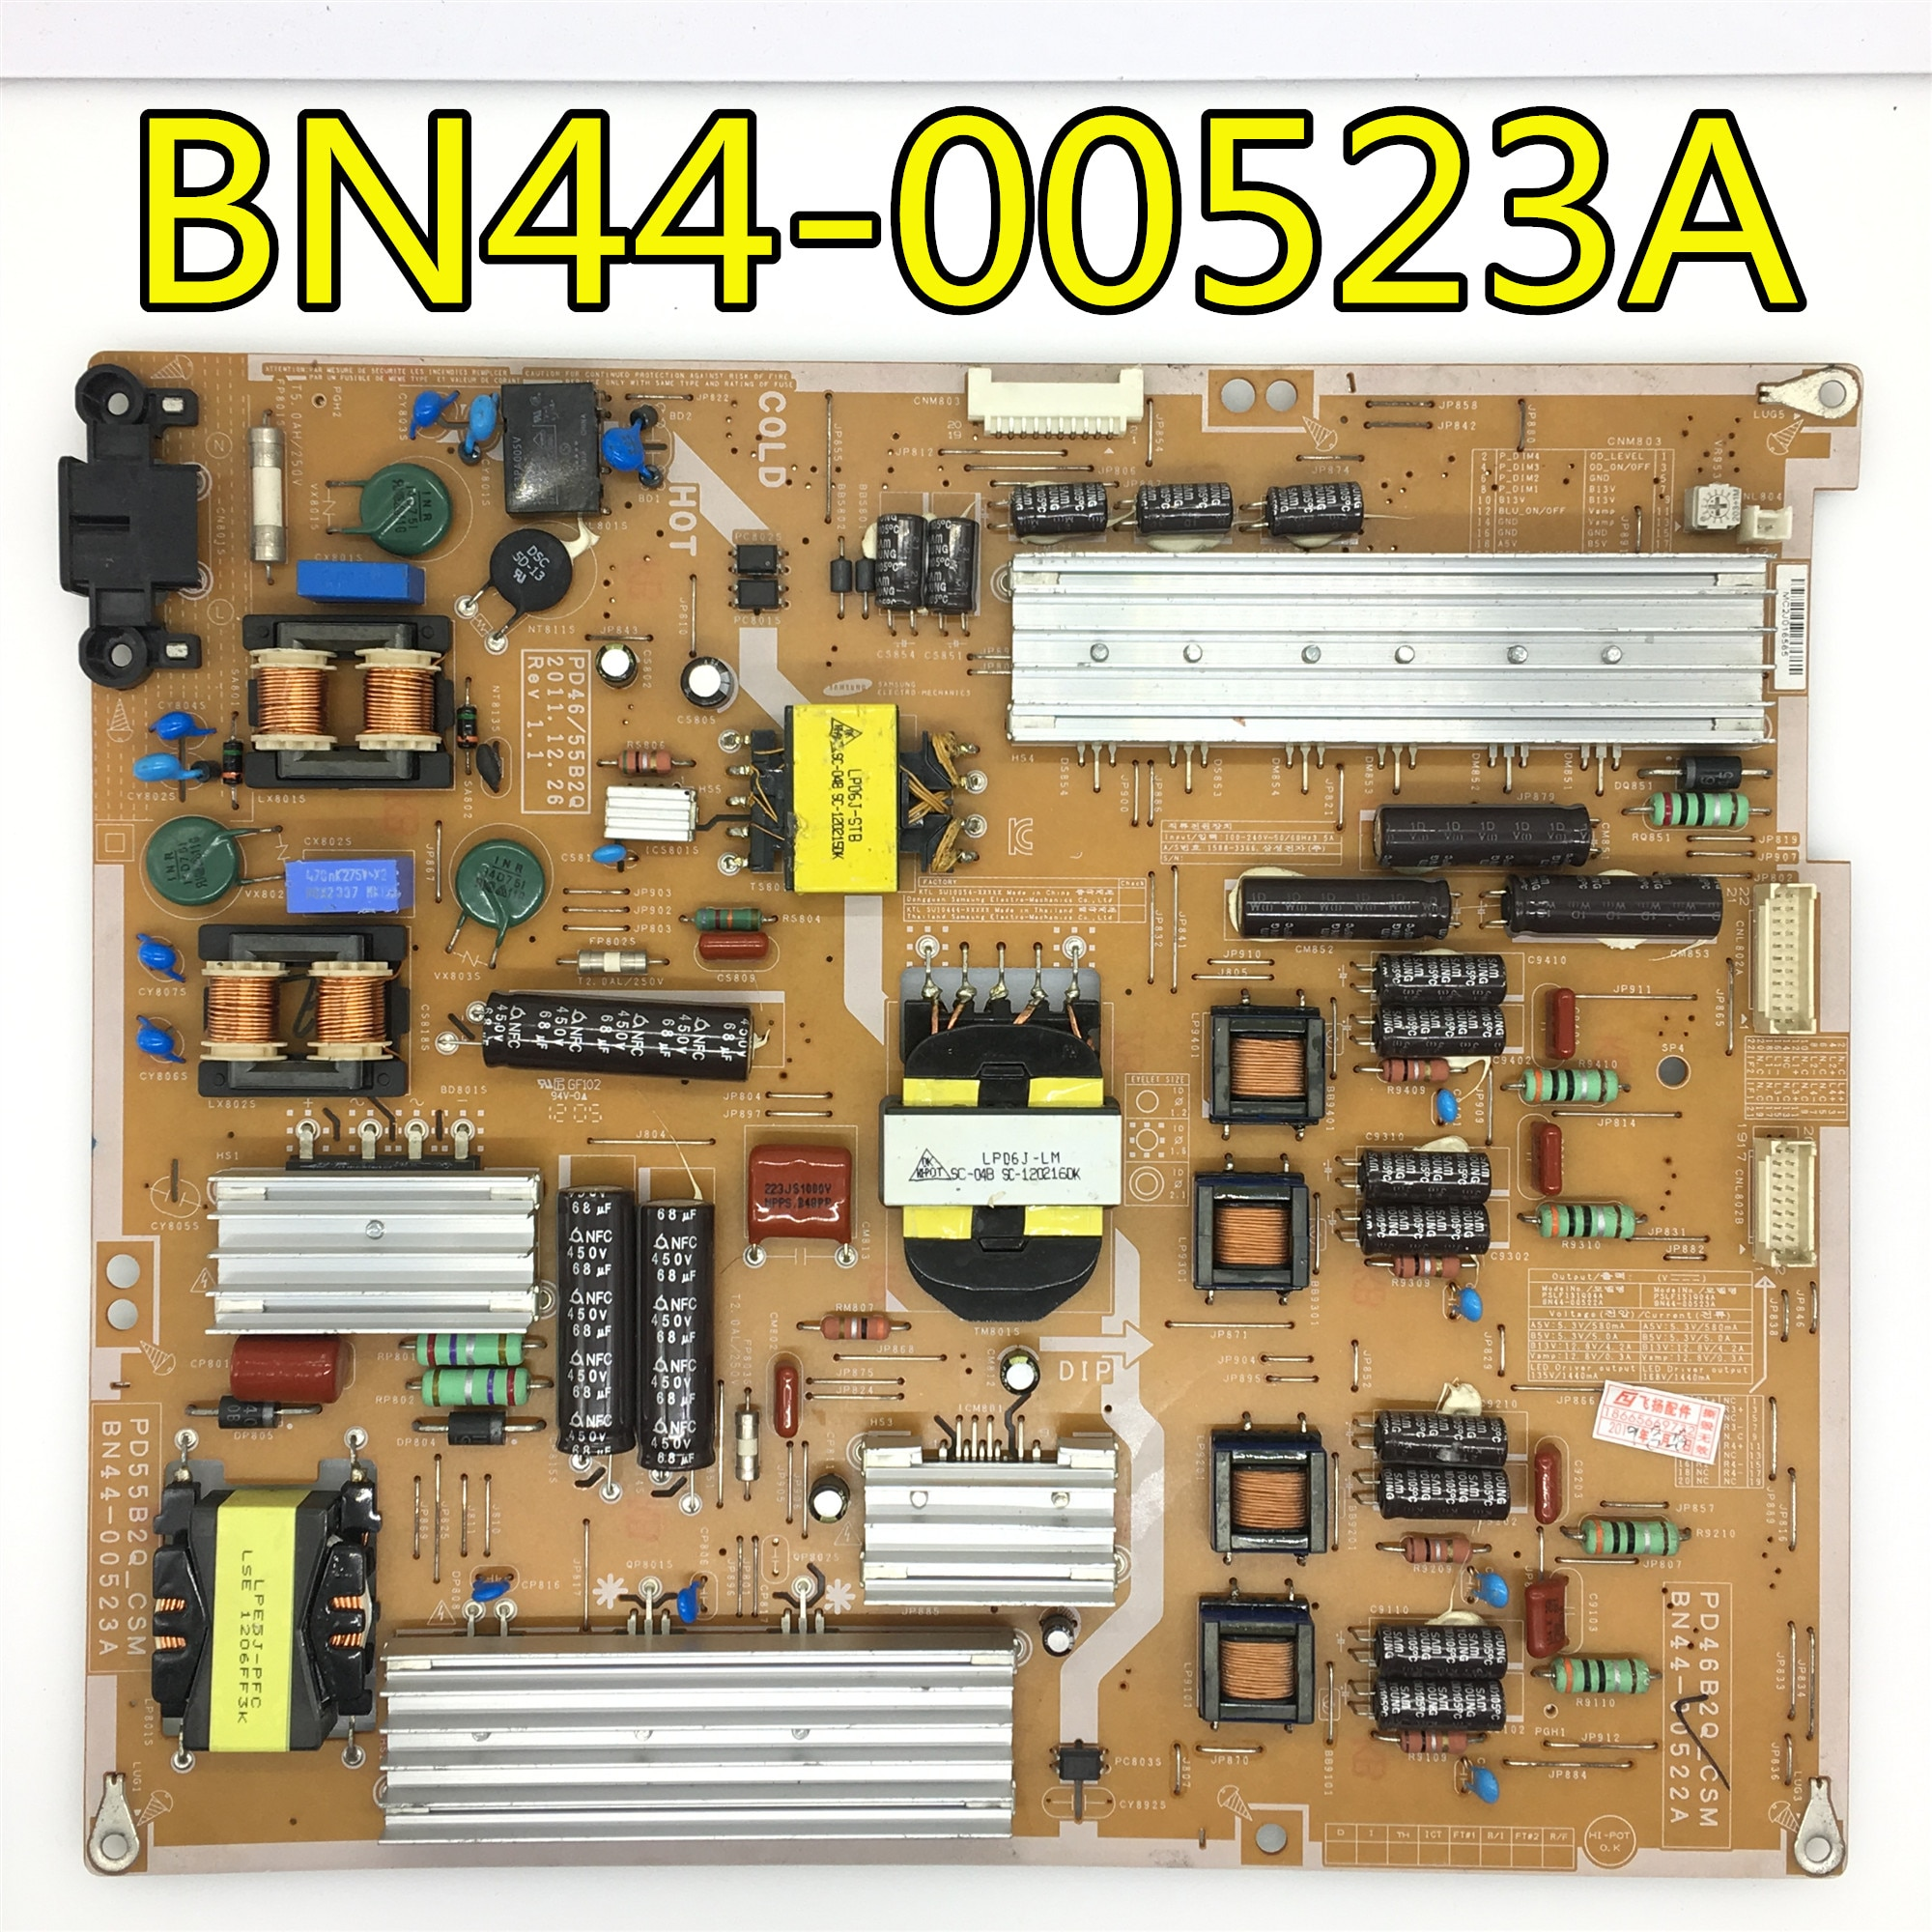 Placa de Energia 100% para Samgsung Teste Original Bn44-00523a Pd46b2q-csm Bn44-00522a Pd55b2q-csm